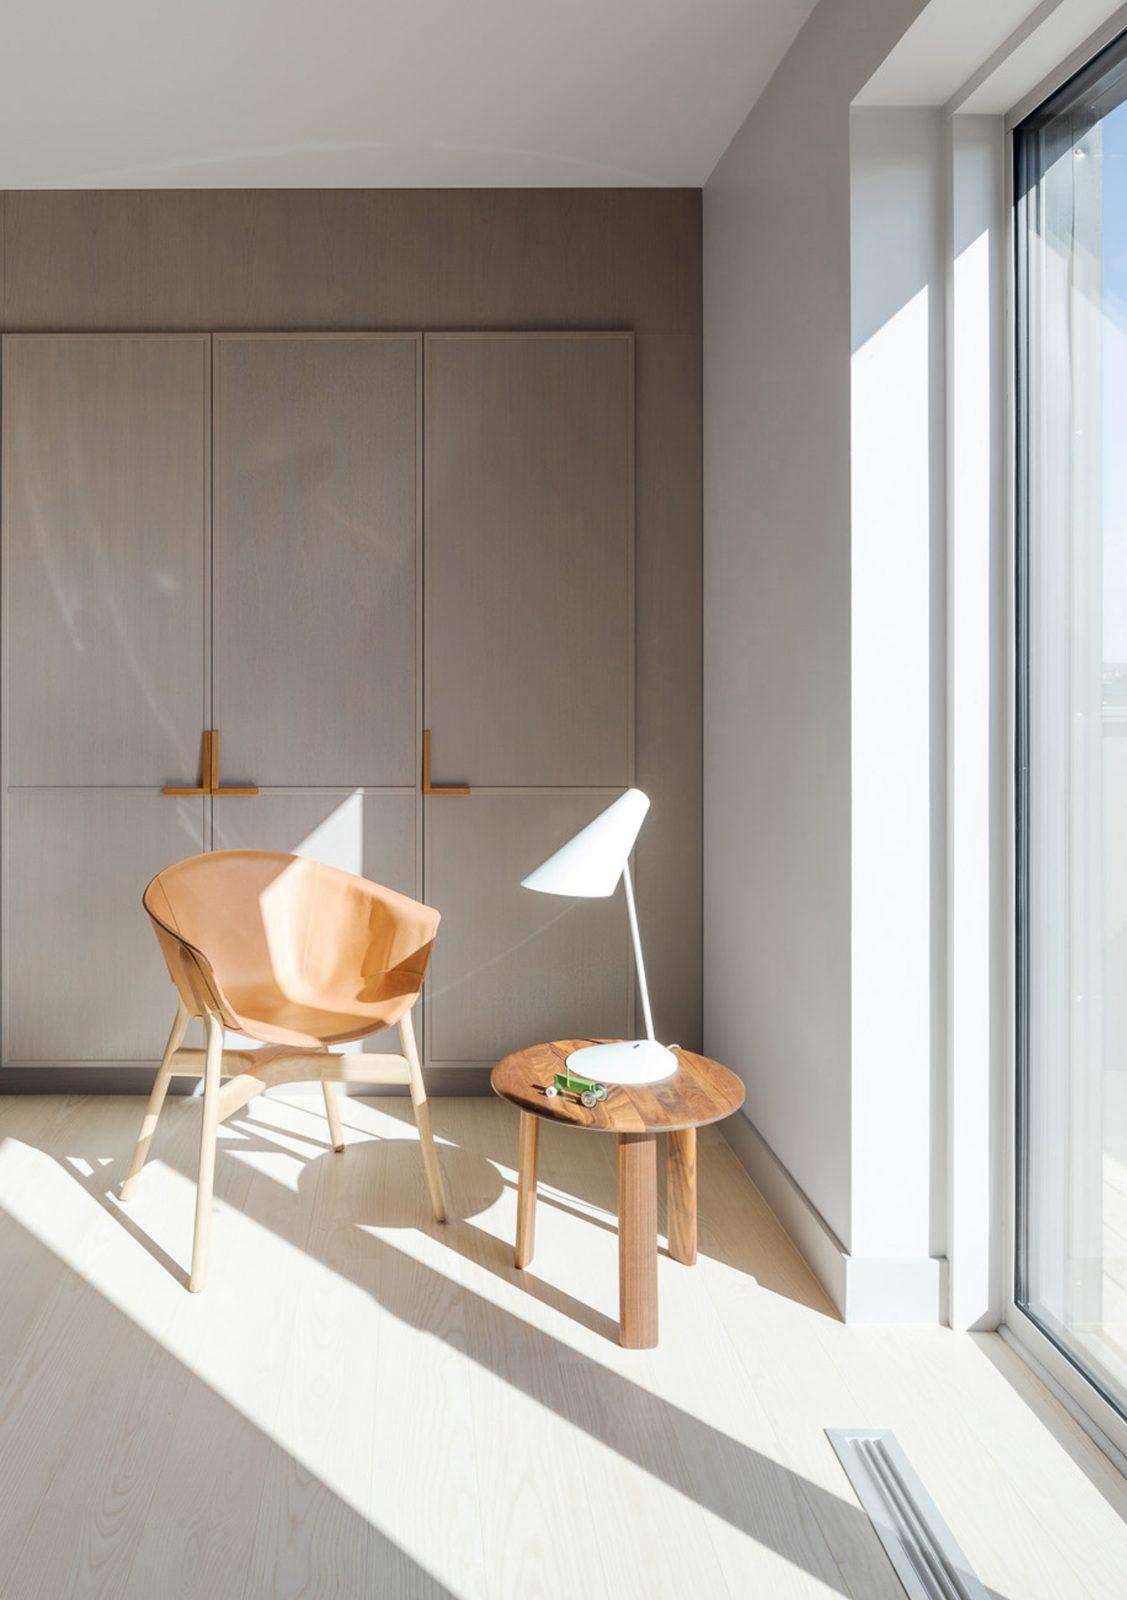 KjellanderSjoberg Etaget AdamMork Interior-01 2324x3300